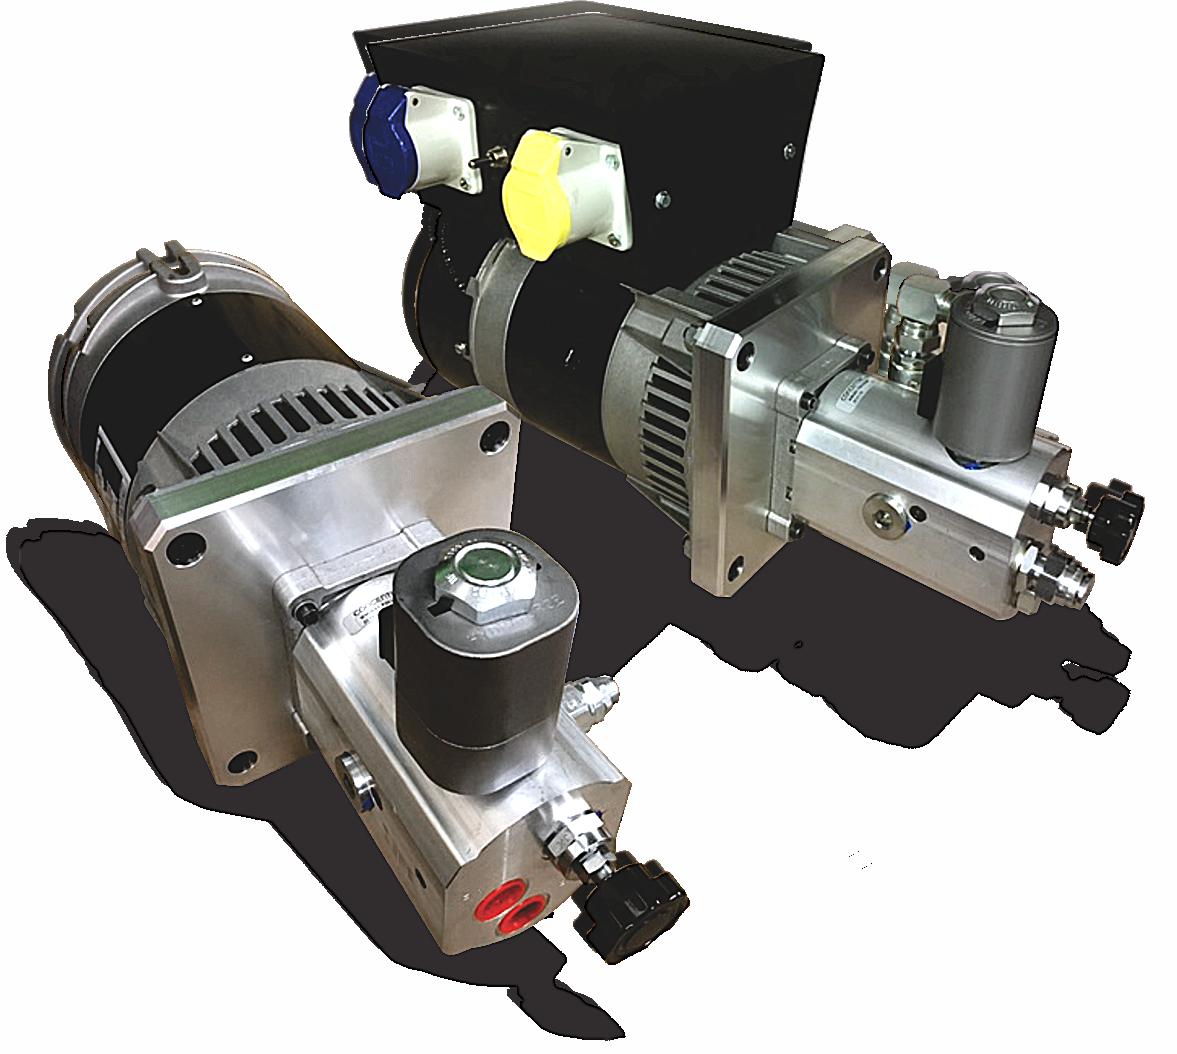 Hydraulically operated generator